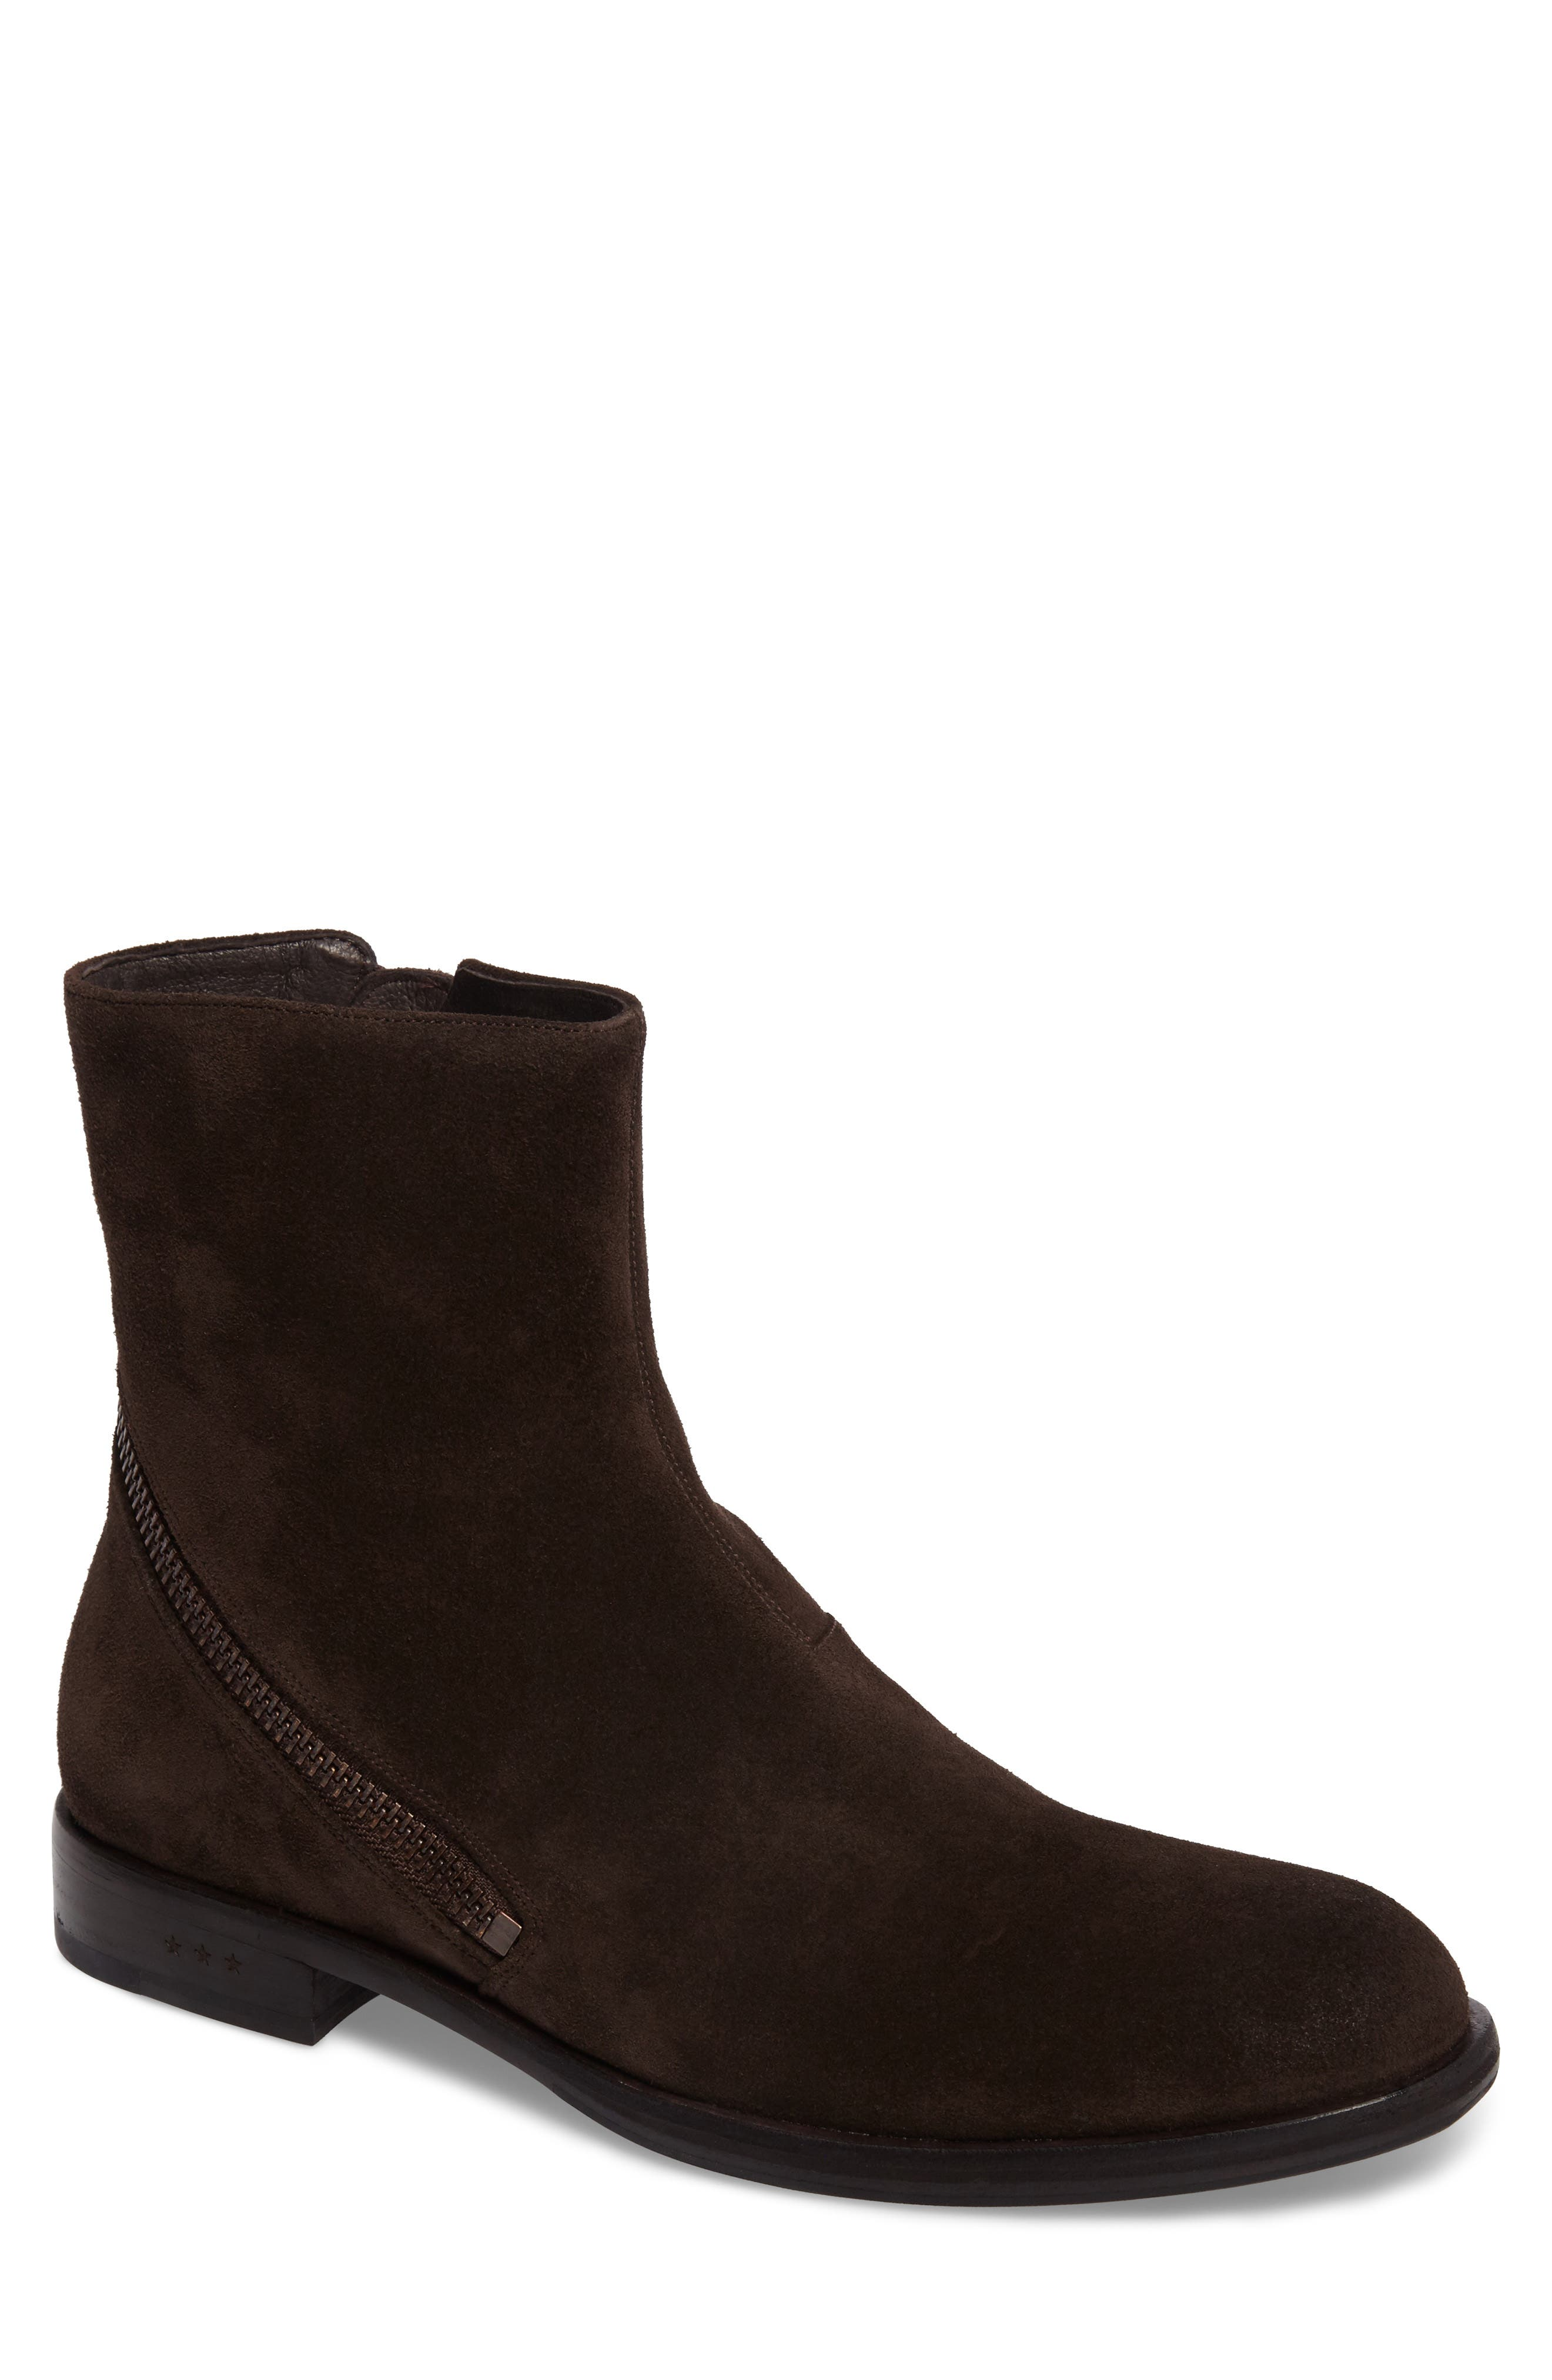 Star USA Waverly Zip Boot,                         Main,                         color, 202